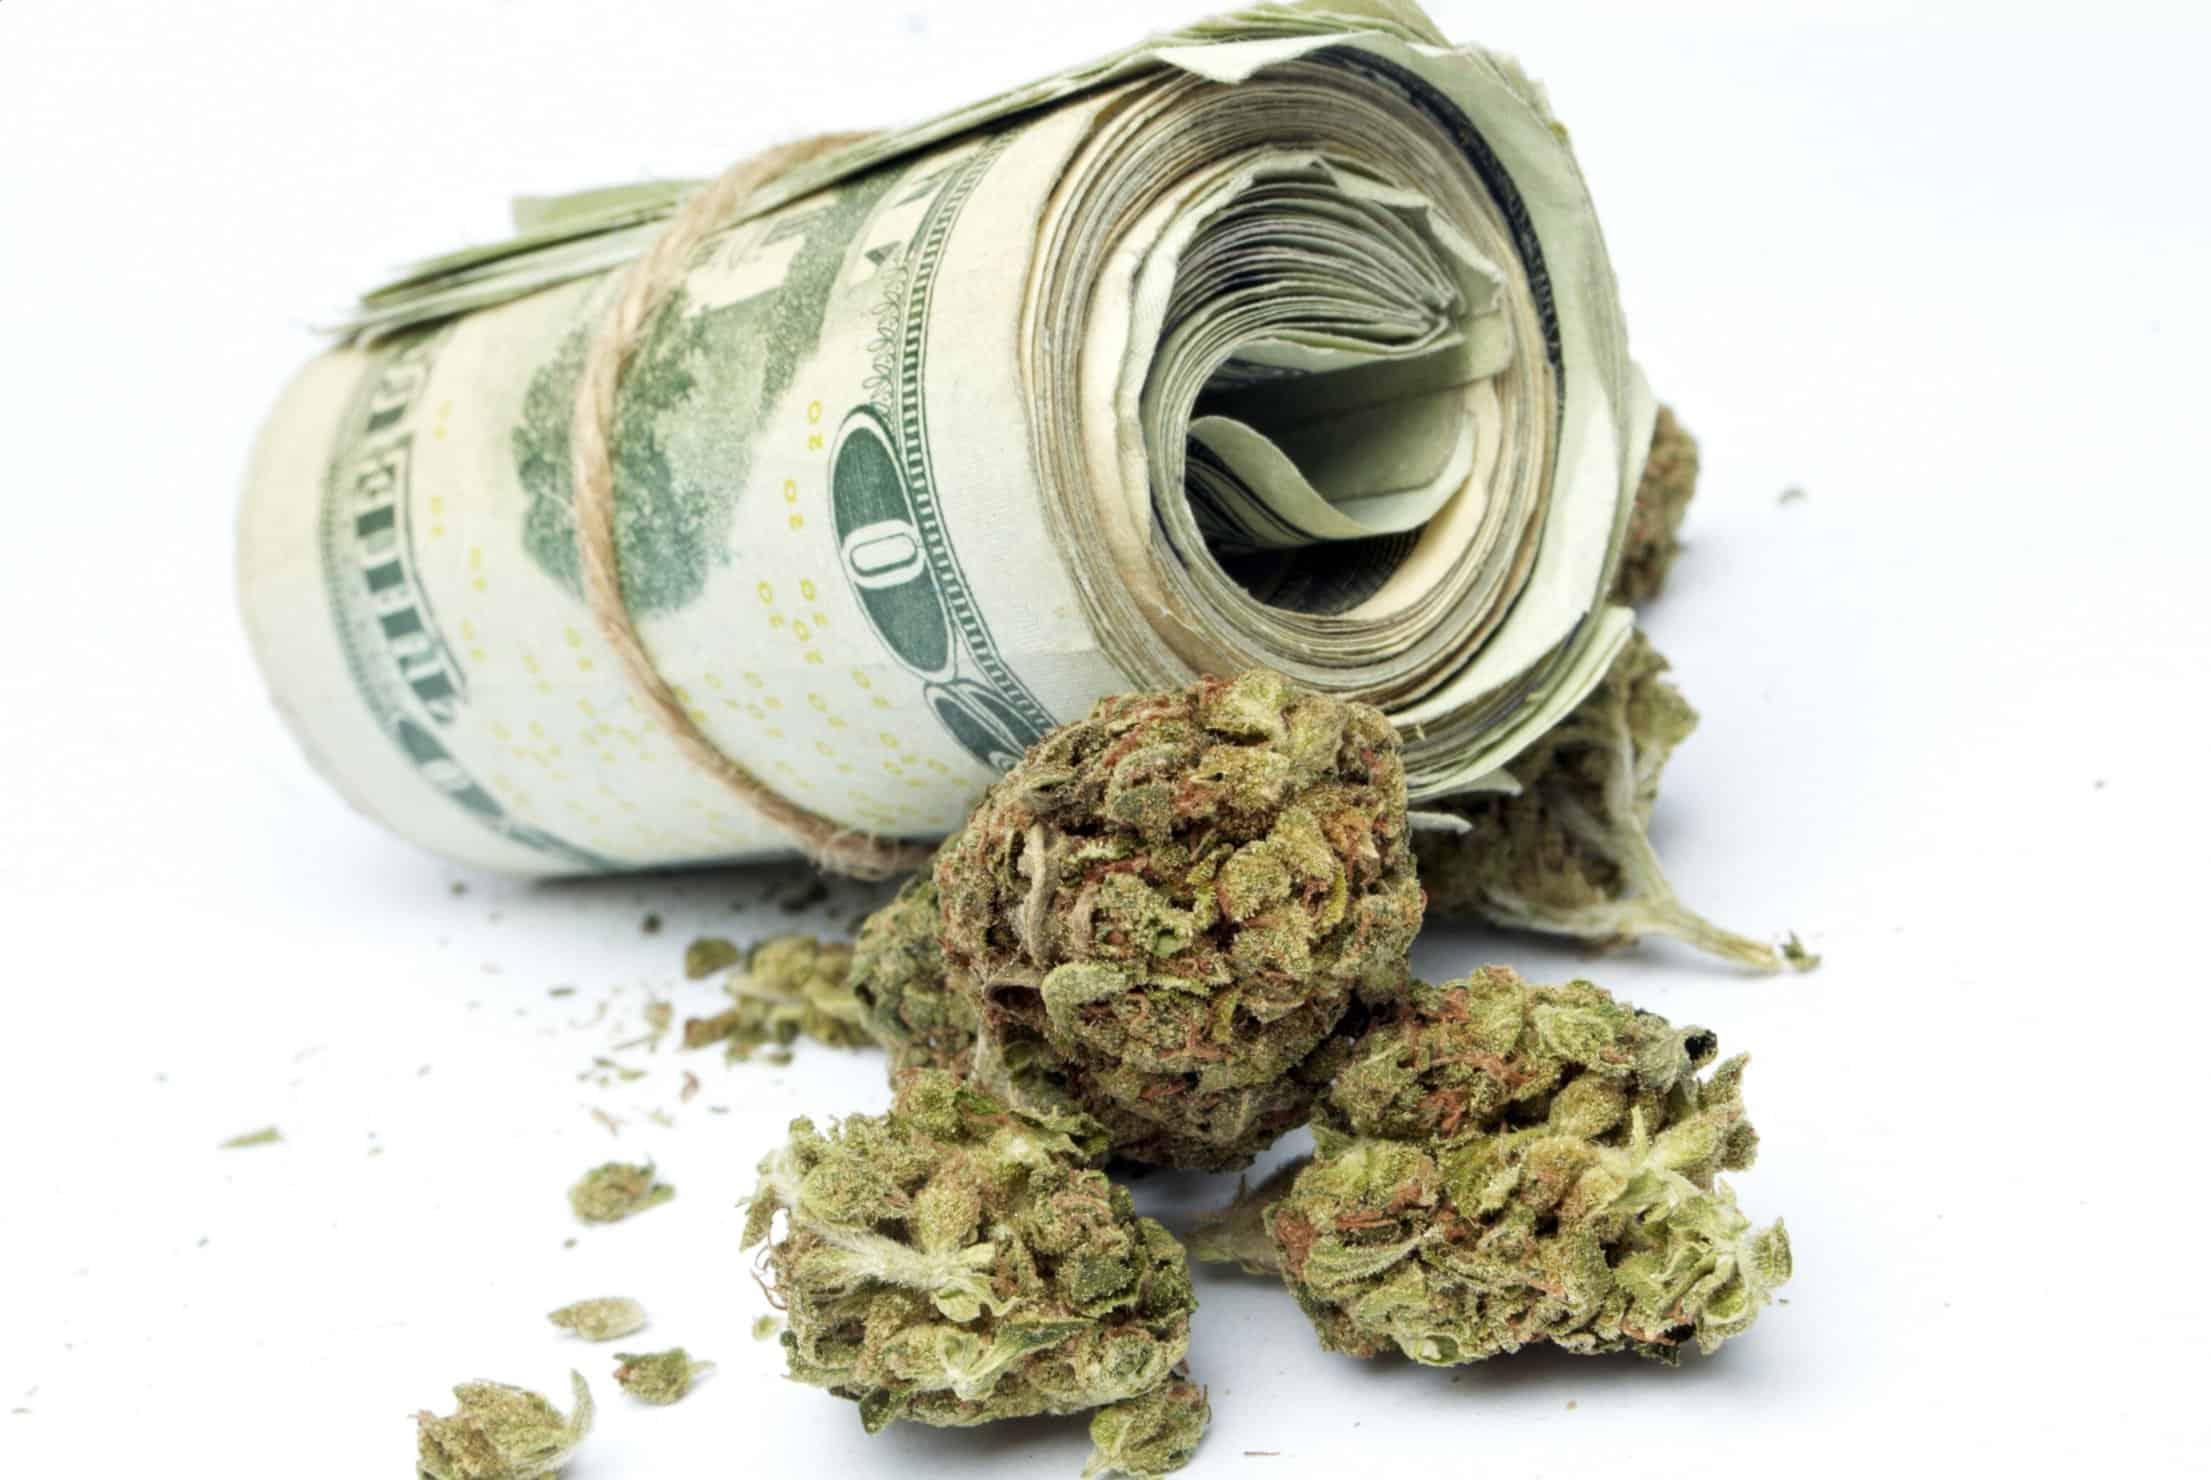 Michigan recreational cannabis sales big first day